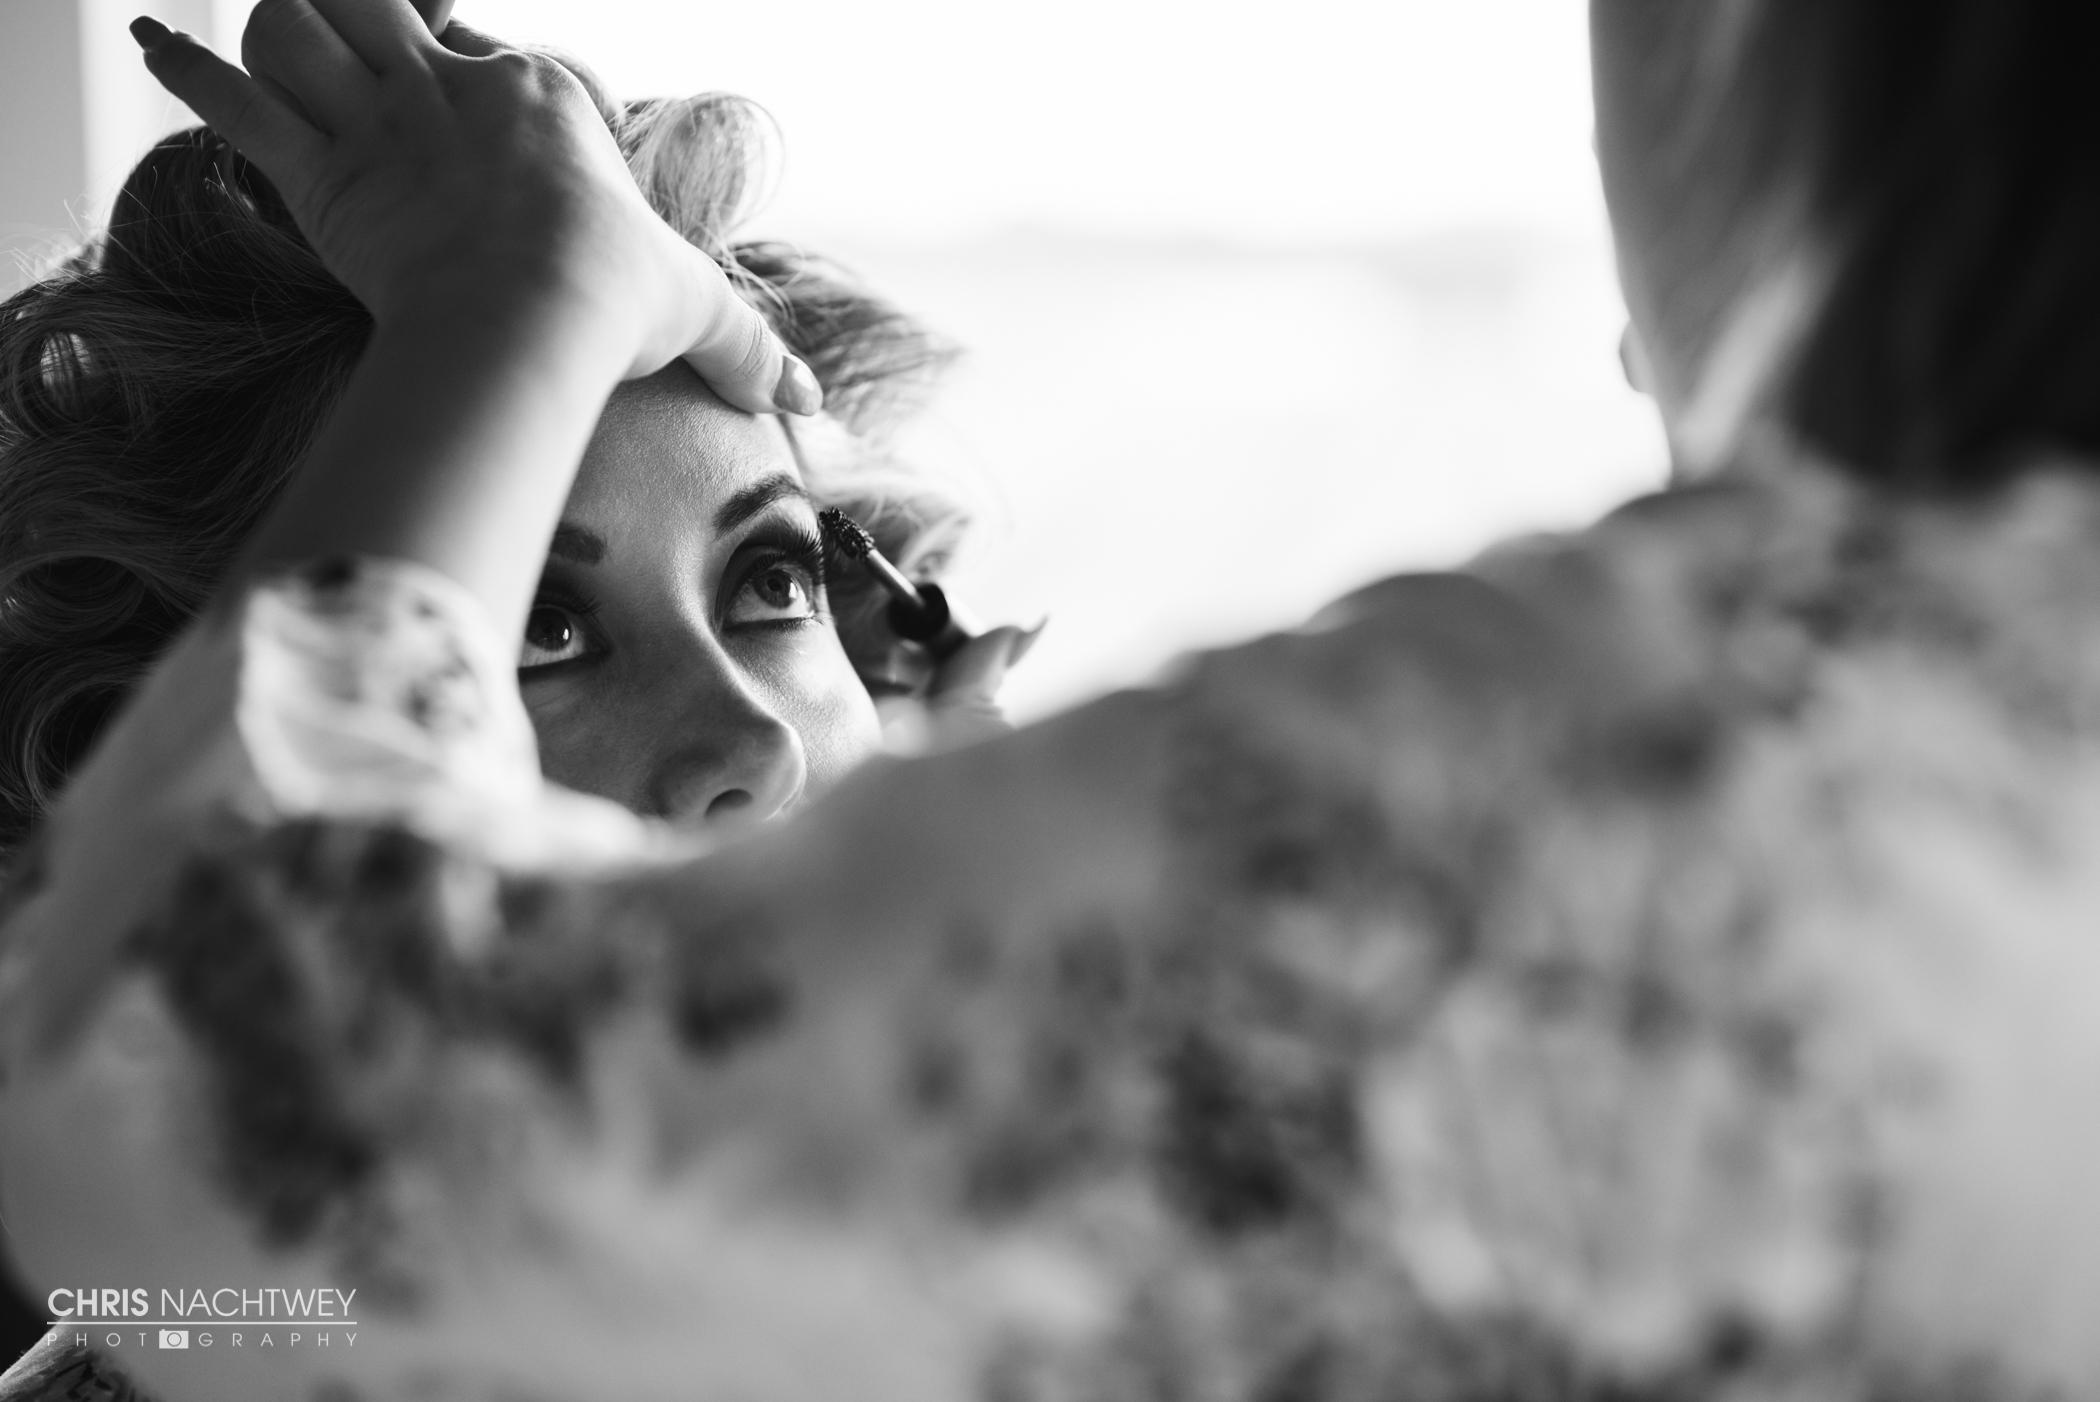 wedding-saltwater-farm-vineyard-photos-stonington-ct-chris-nachtwey-photography-2016-ana-austin-5.jpg